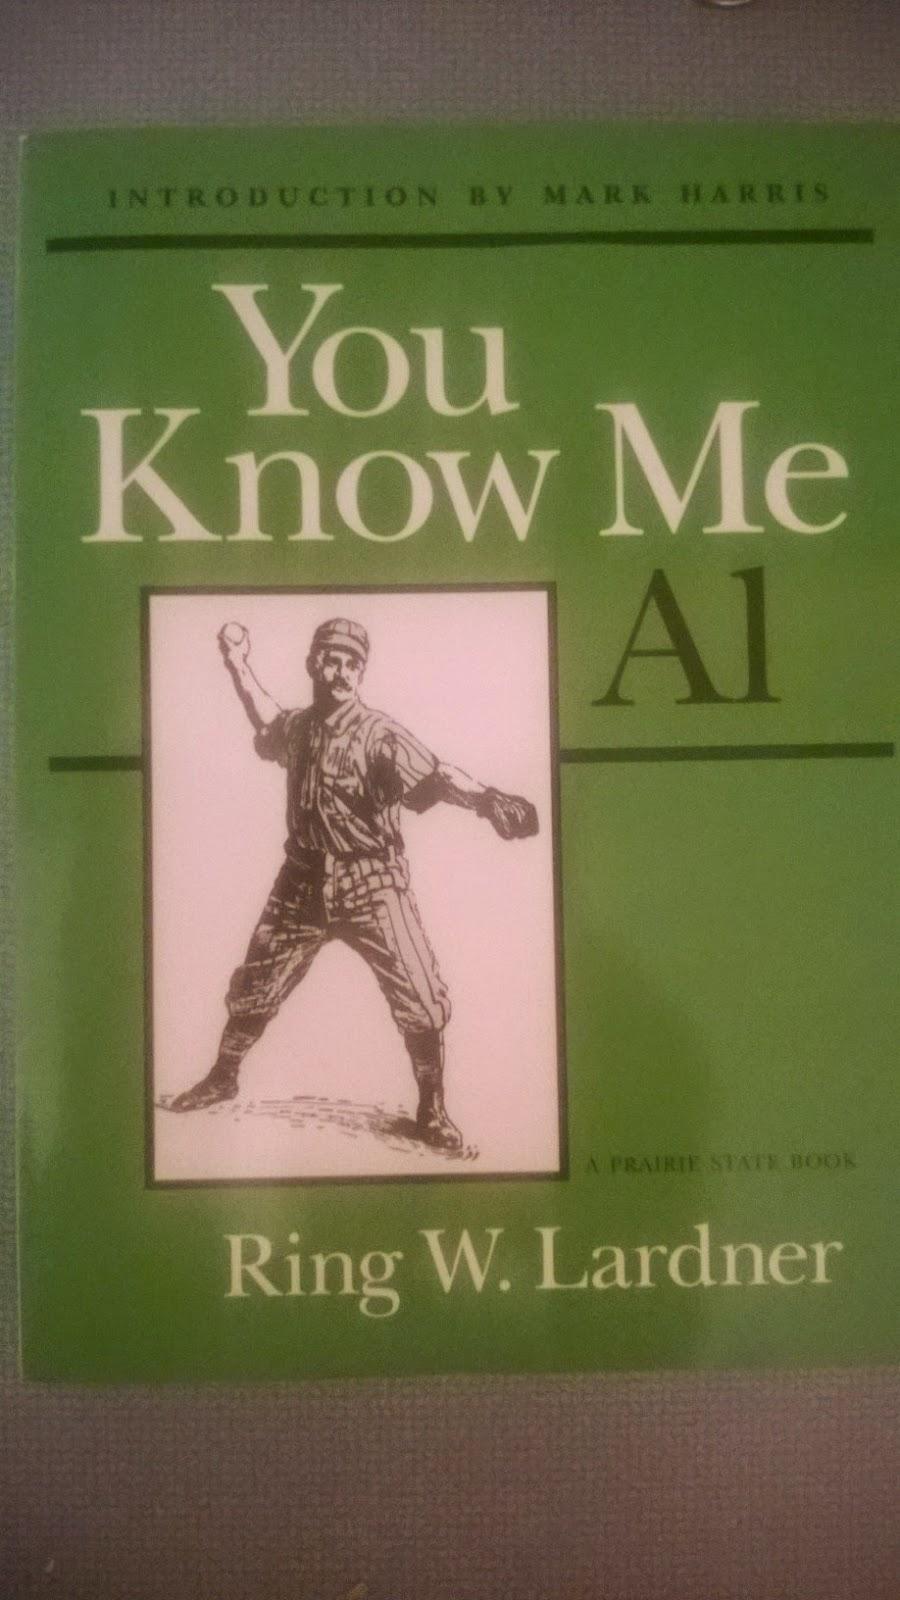 Strange At Ecbatan Old Bestsellers You Know Me Al By Ring W Lardner